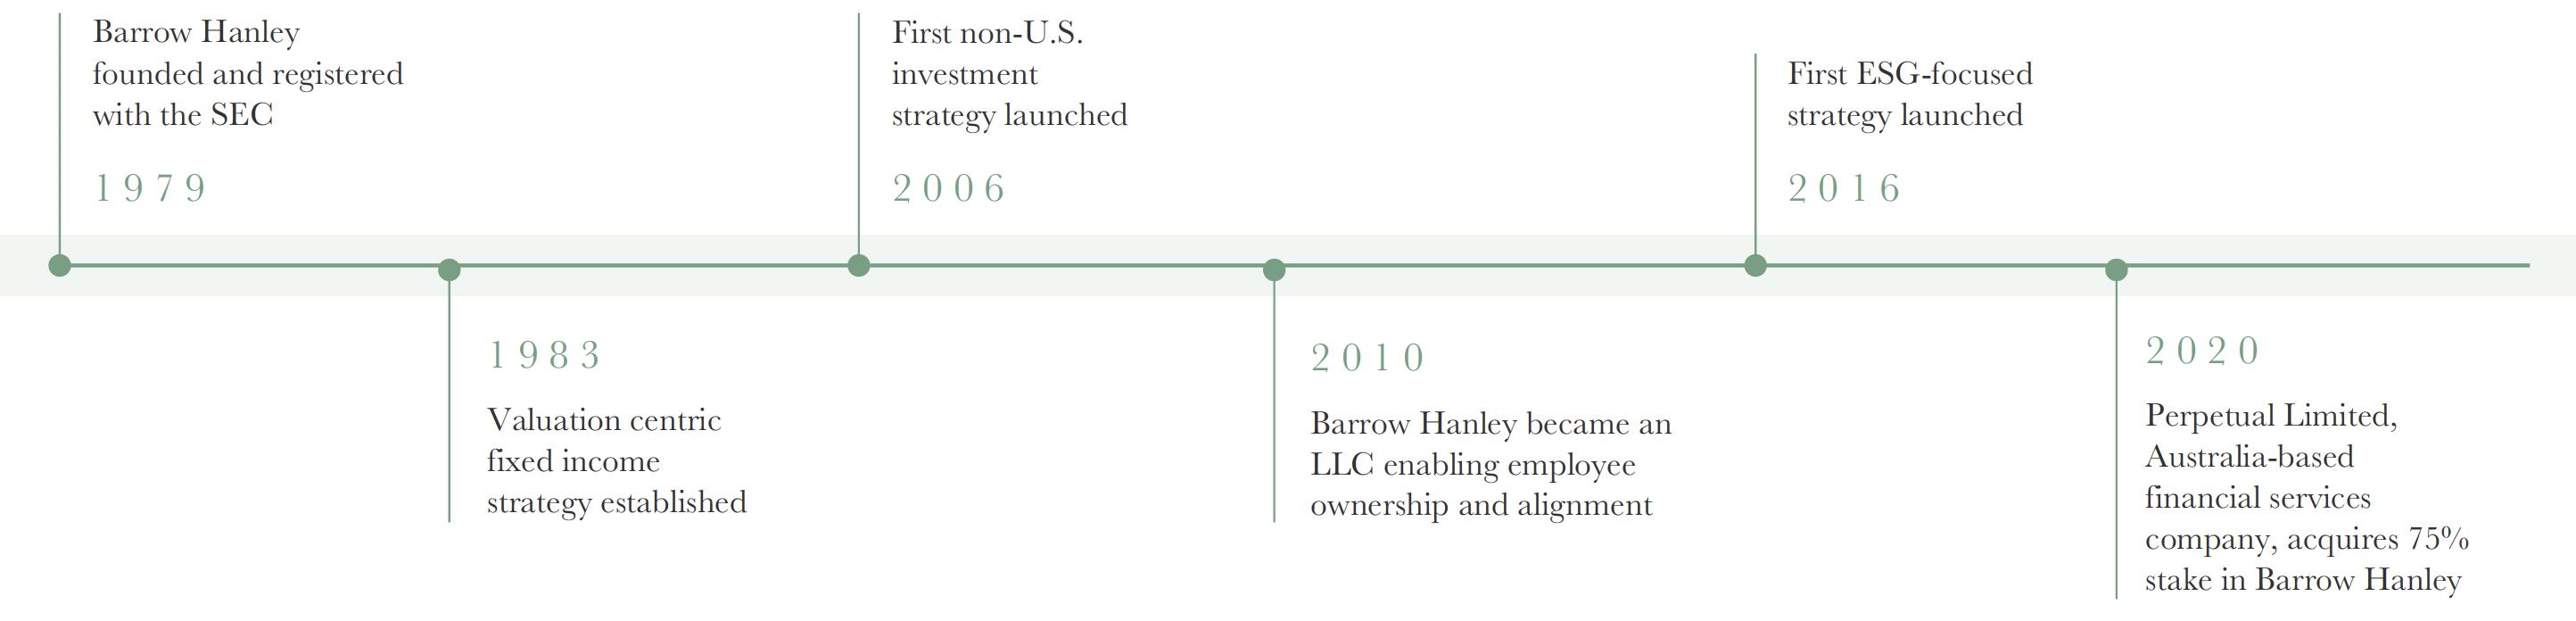 Barrow Hanley Timeline